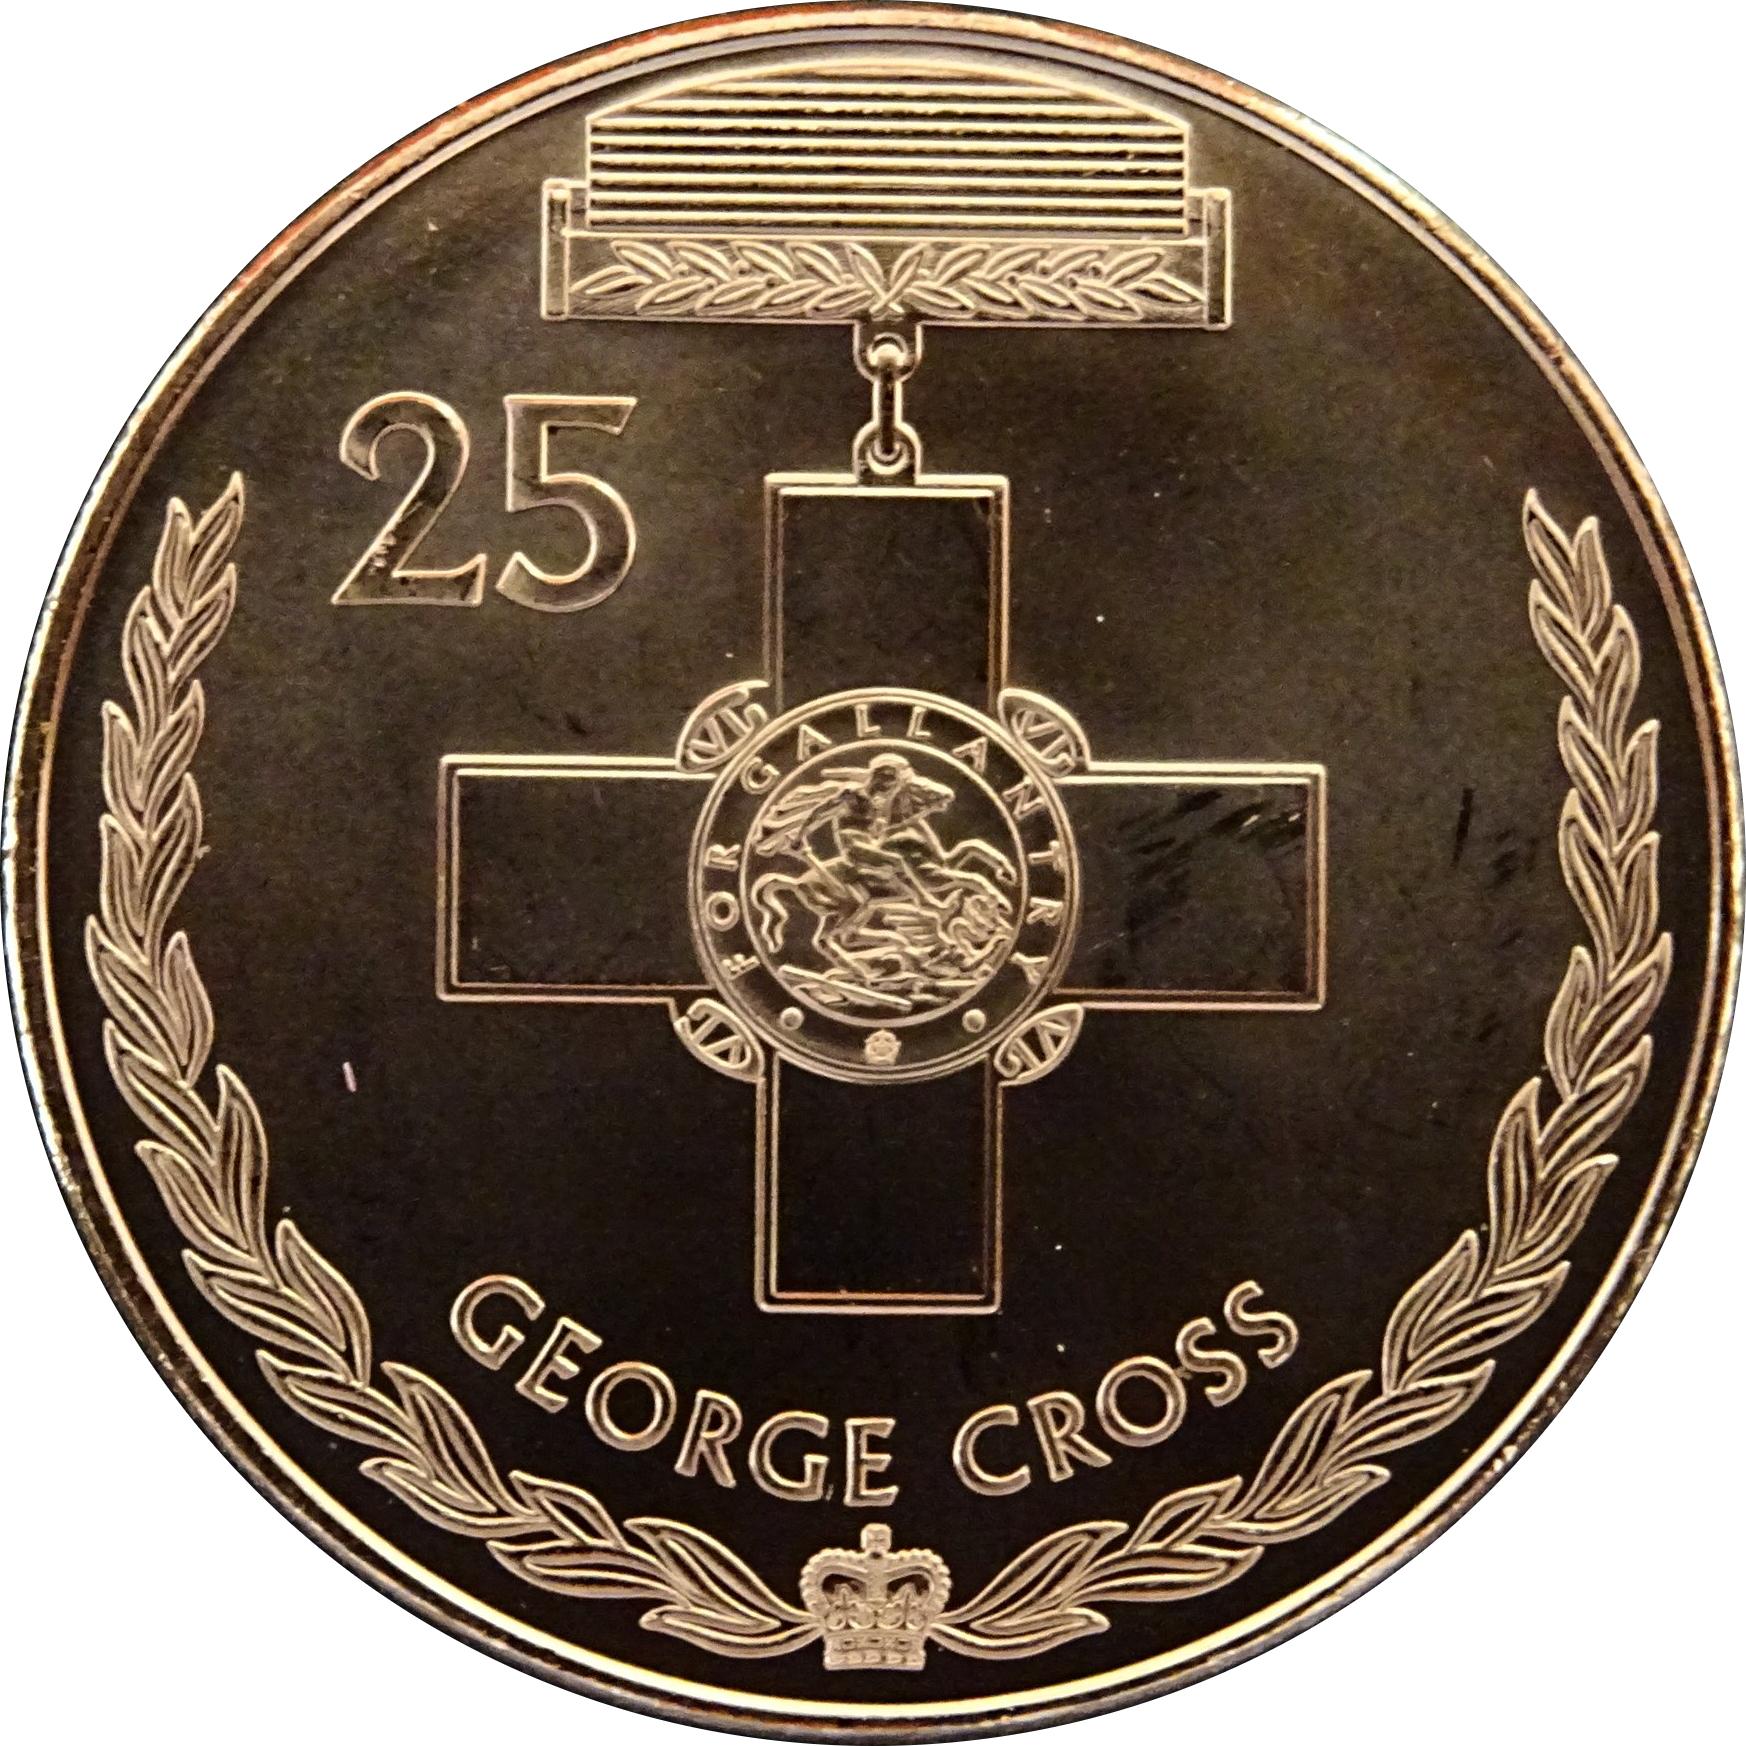 25 cents elizabeth ii george cross australia numista 25 cents elizabeth ii george cross buycottarizona Gallery